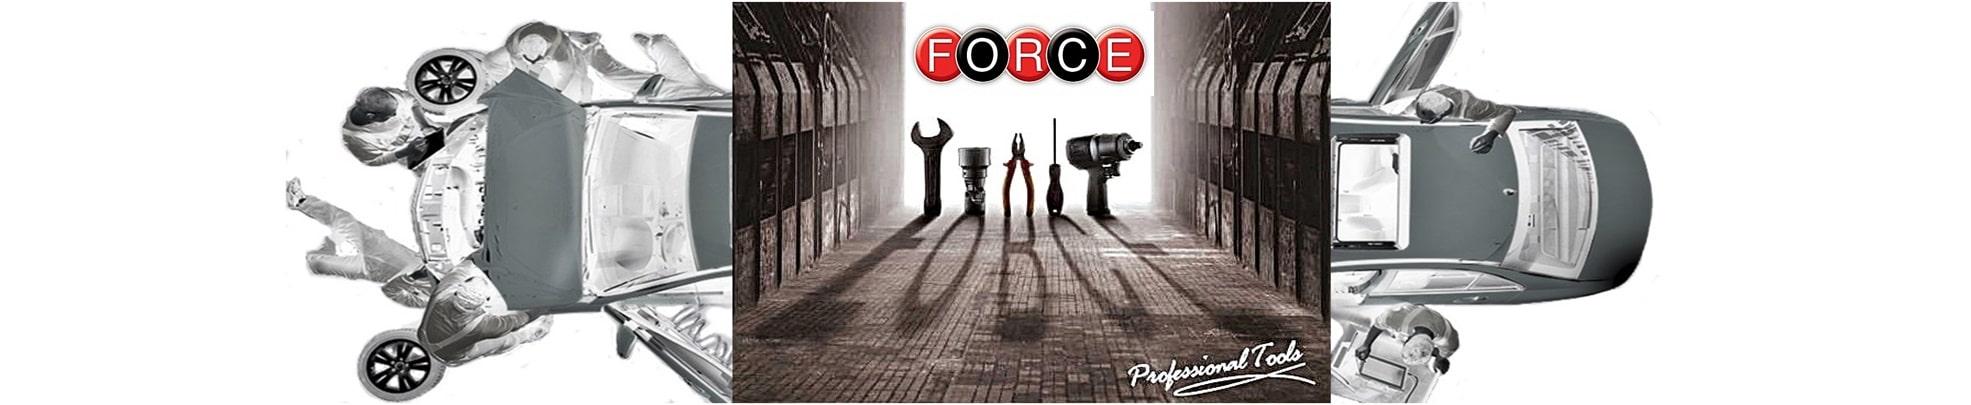 Force-professional-tools